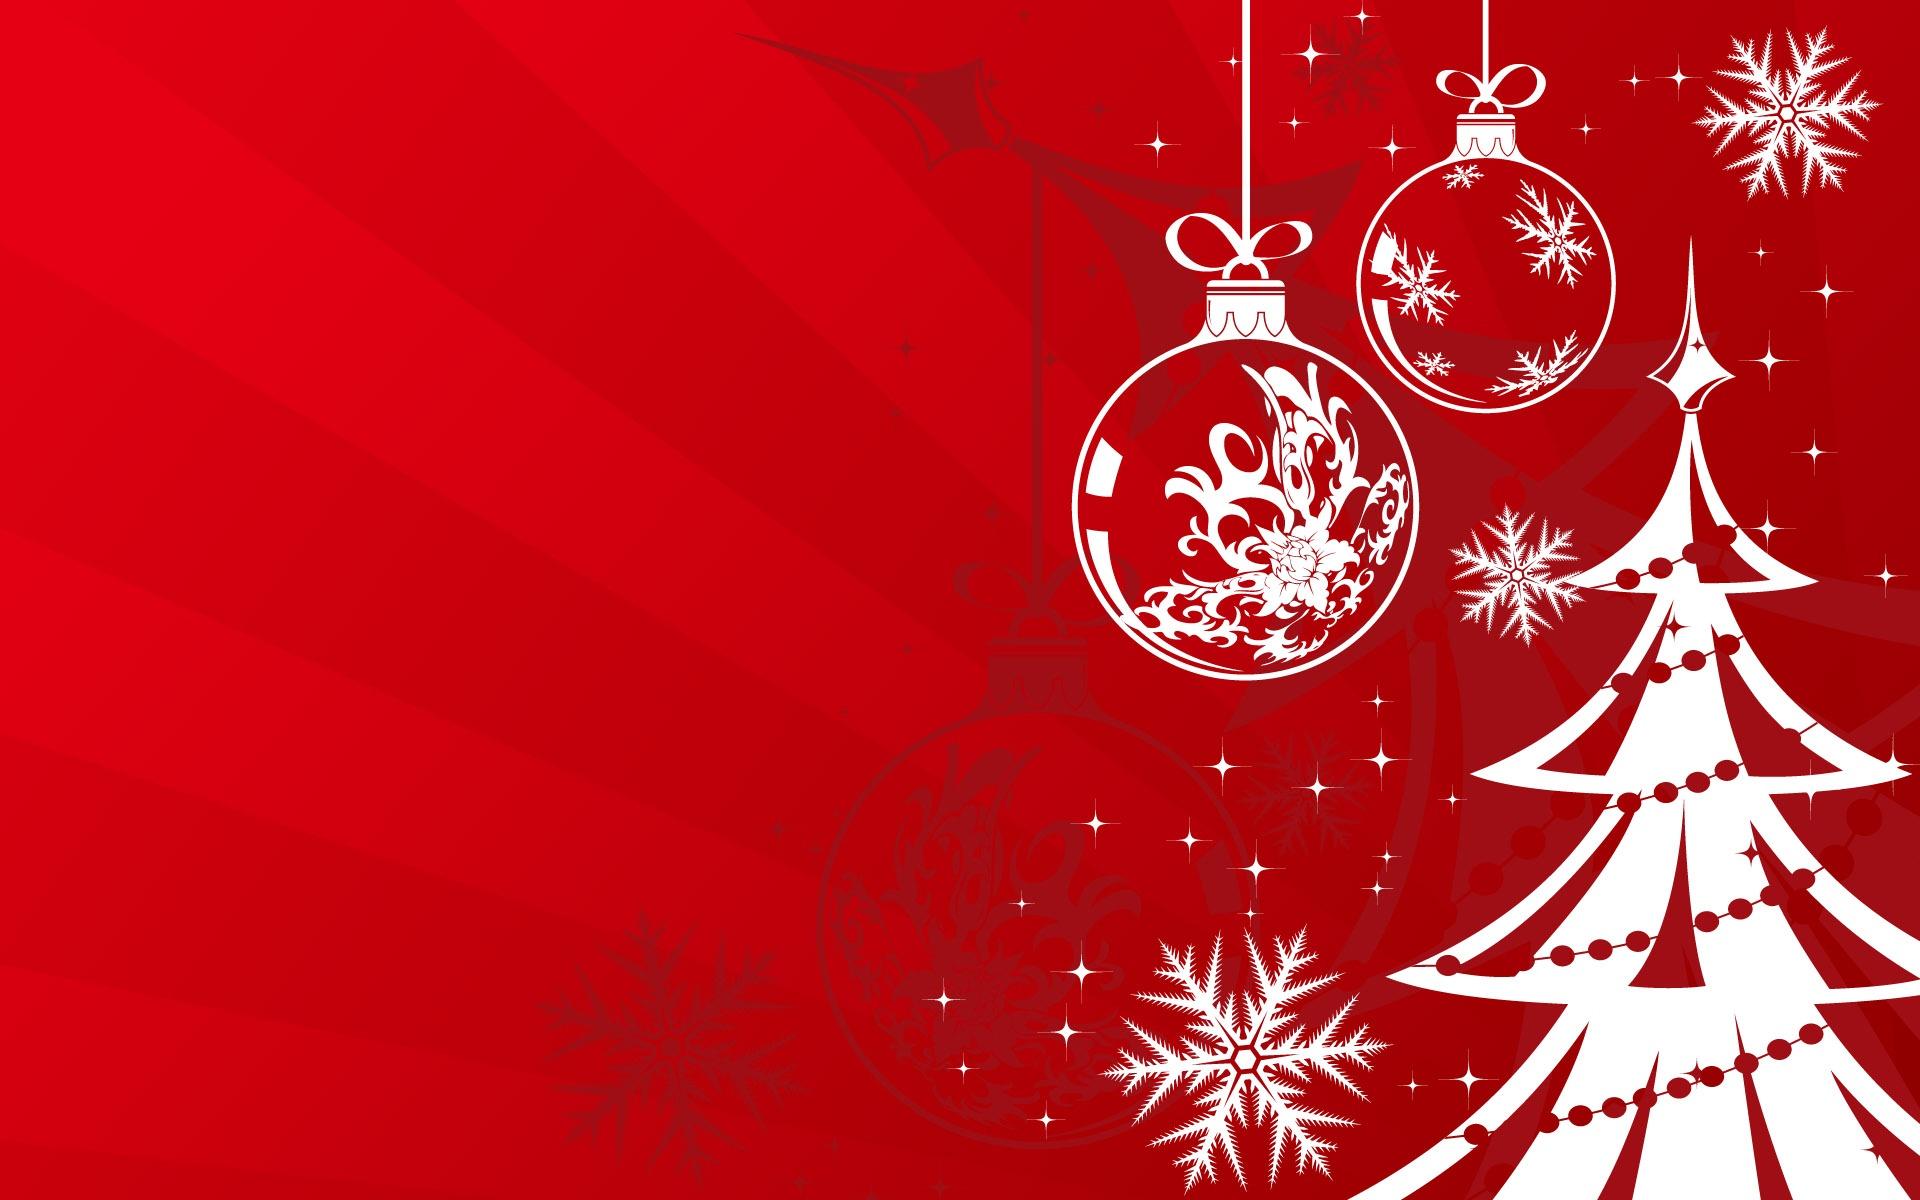 Frasi Di Natale A Forma Di Albero.Frasi Auguri Di Natale Per Una Persona Speciale